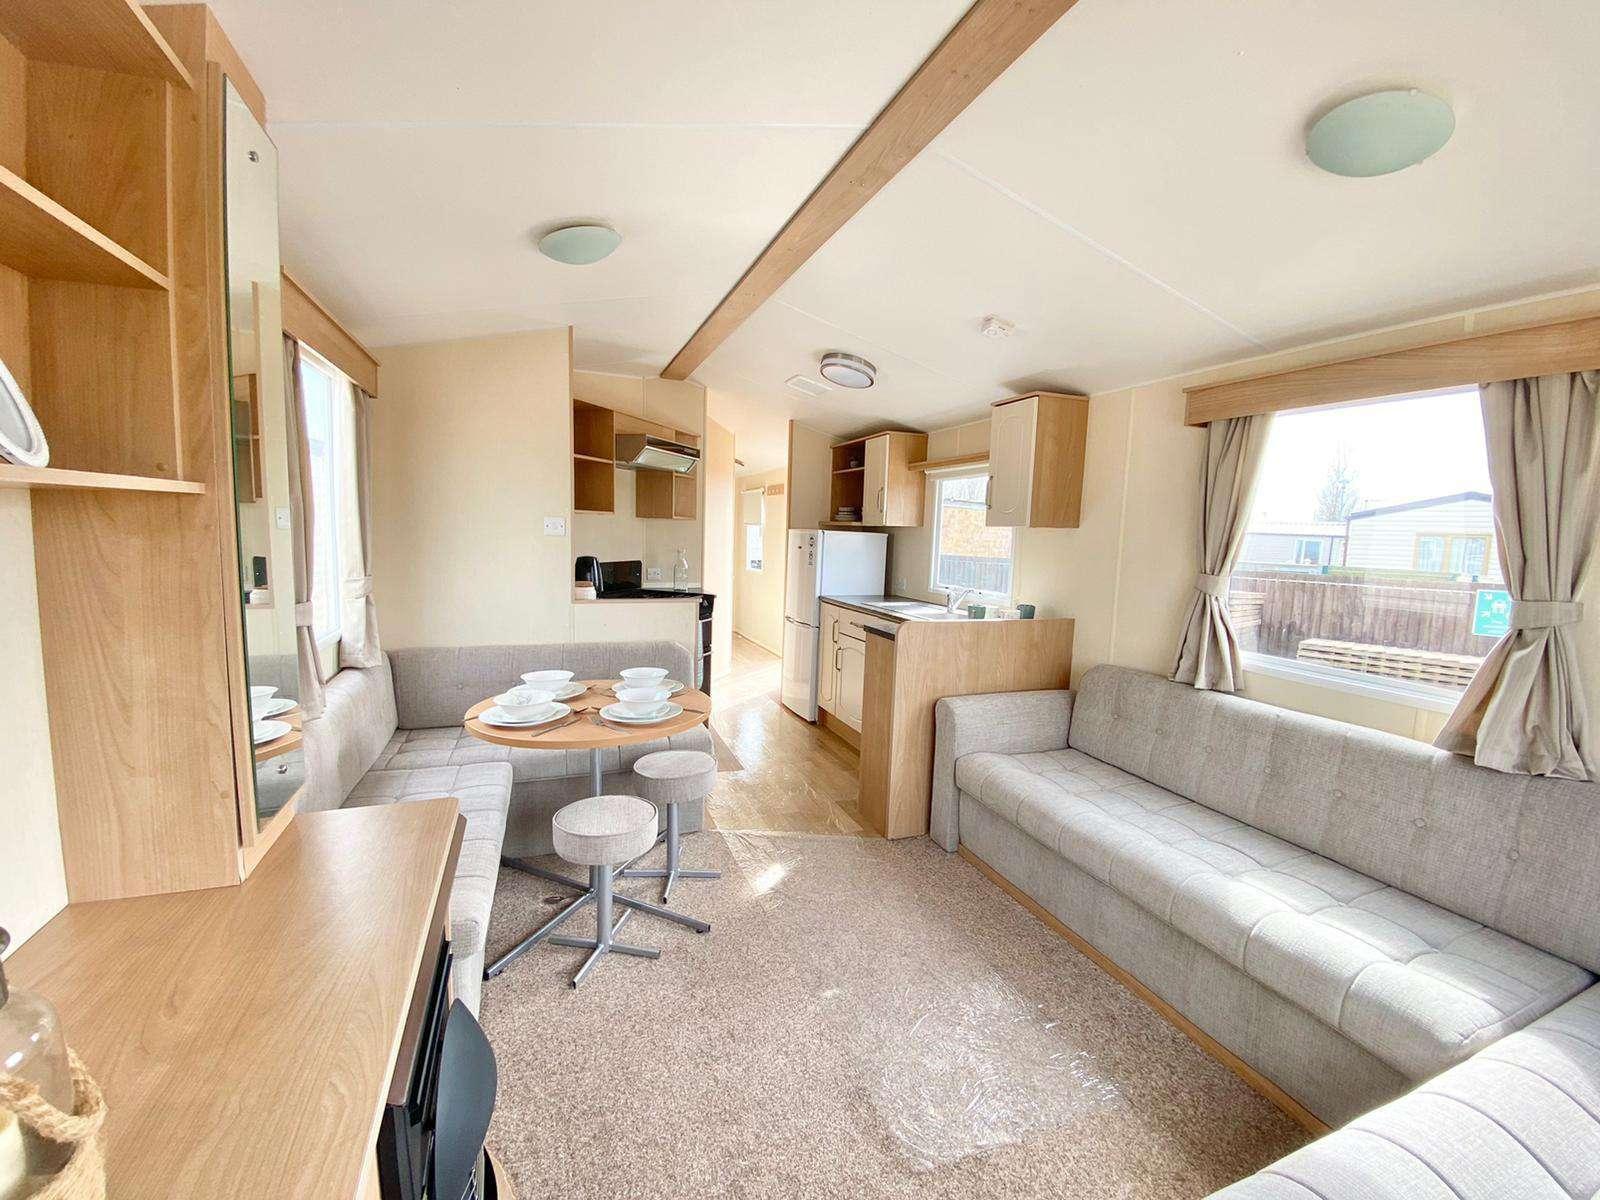 50026F – Fulmar area, 3 bed, 8 berth caravan near amenities. Emerald rated. - property